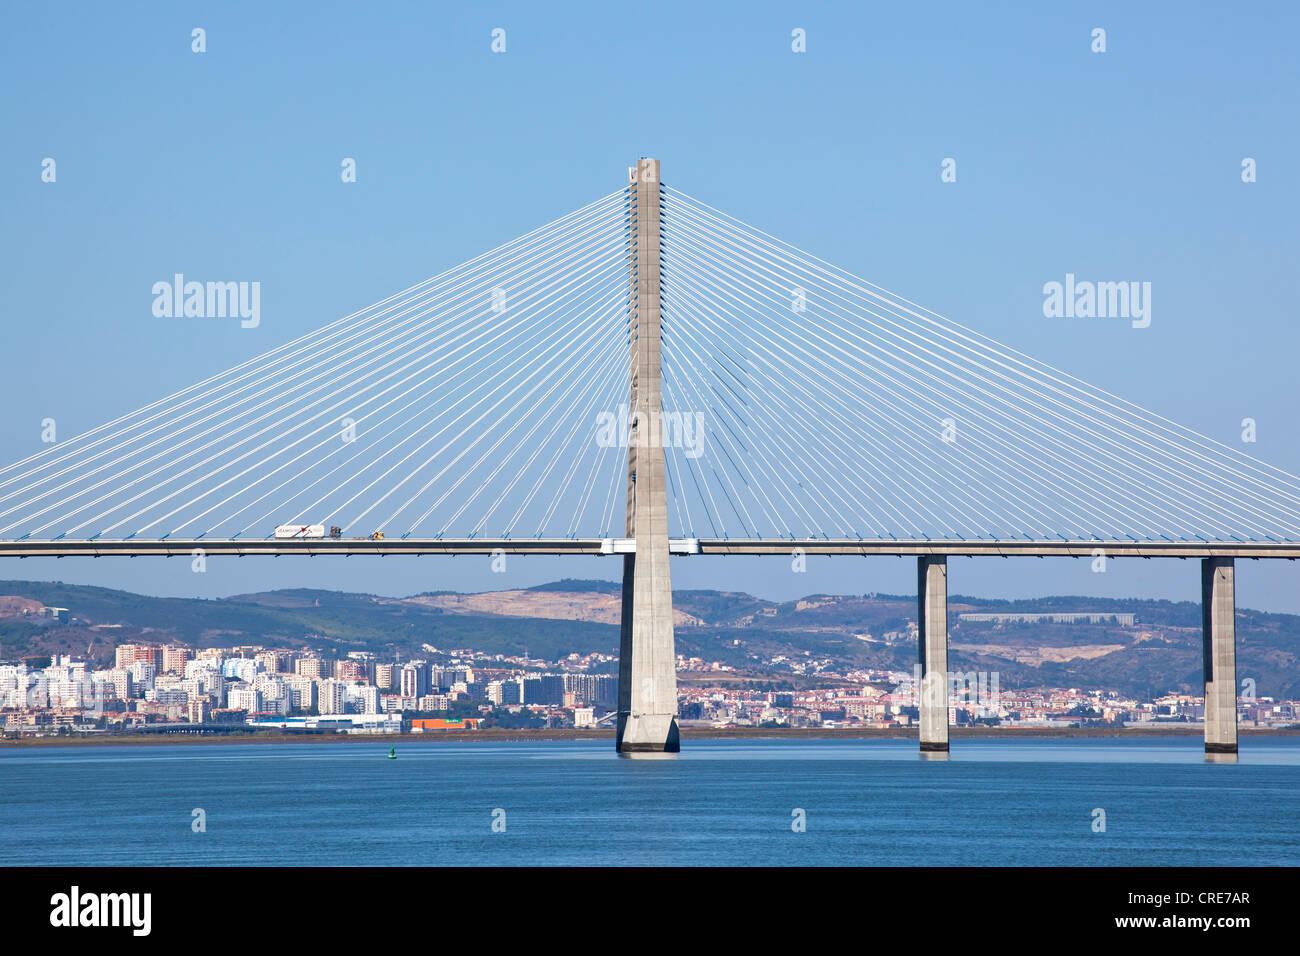 Ponte Vasco da Gama bridge crossing the Rio Tejo River, Lisbon, Portugal, Europe - Stock Image